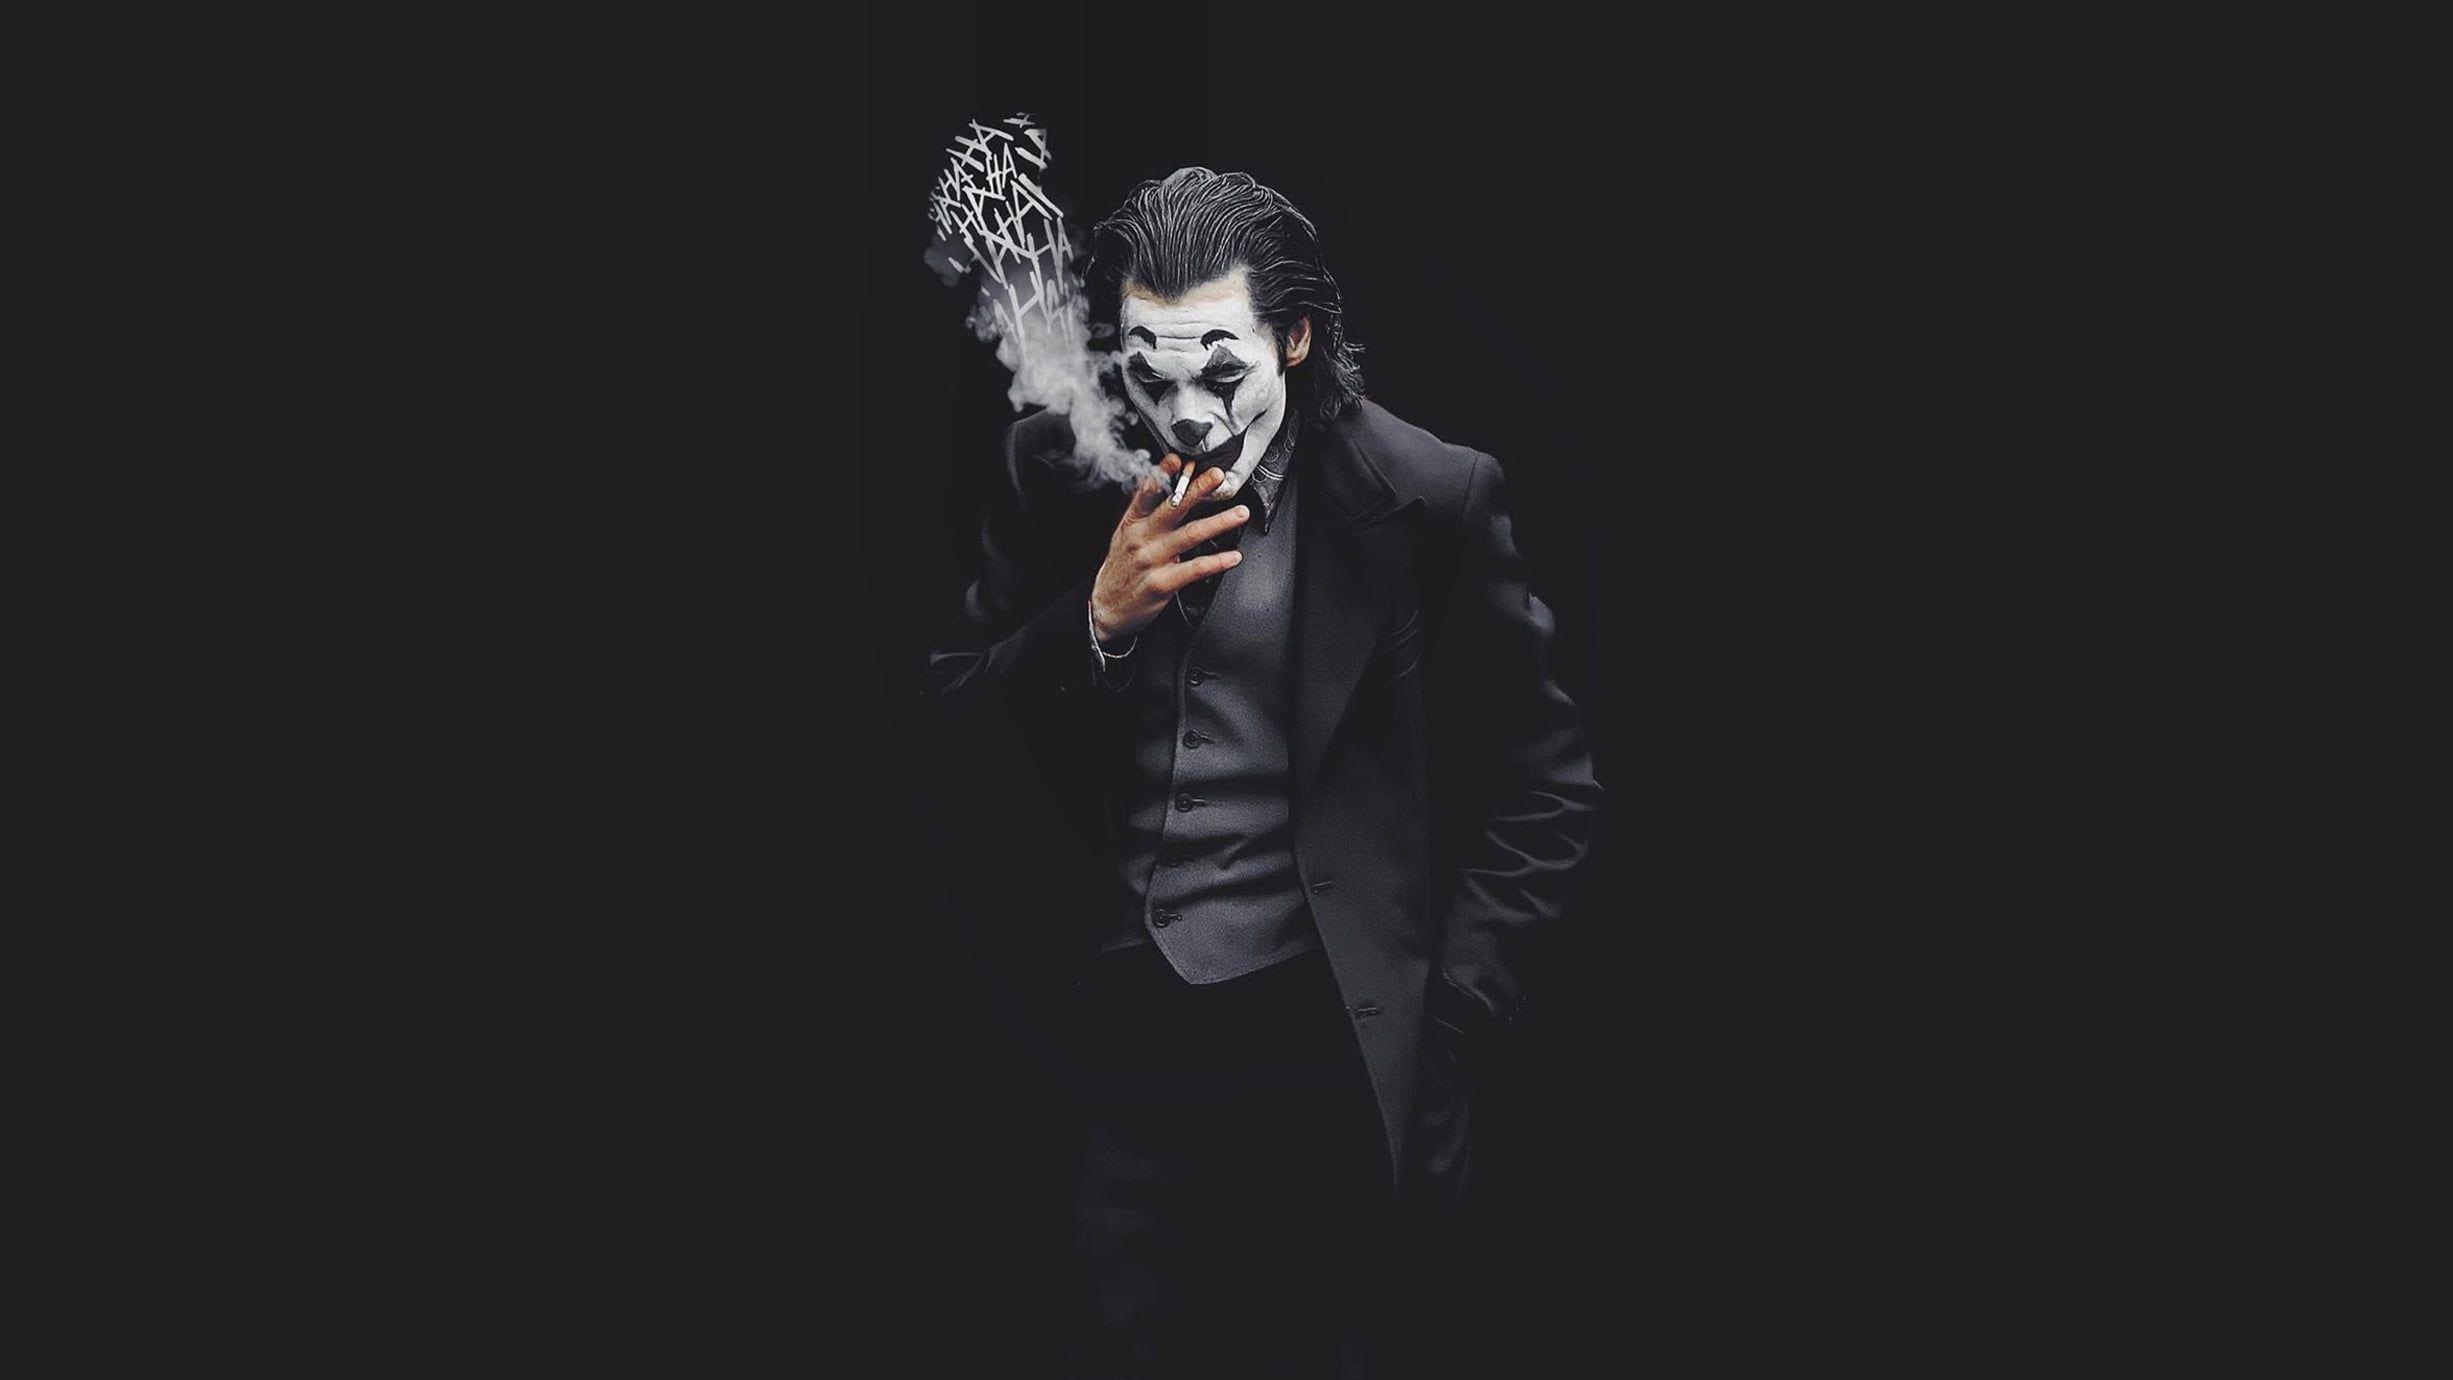 Joker Black Dc Comics Batman Joaquin Phoenix Movie Characters 2019 1080p Wallpaper Hdwallpape Joker Hd Wallpaper Joker Wallpapers Joker Iphone Wallpaper